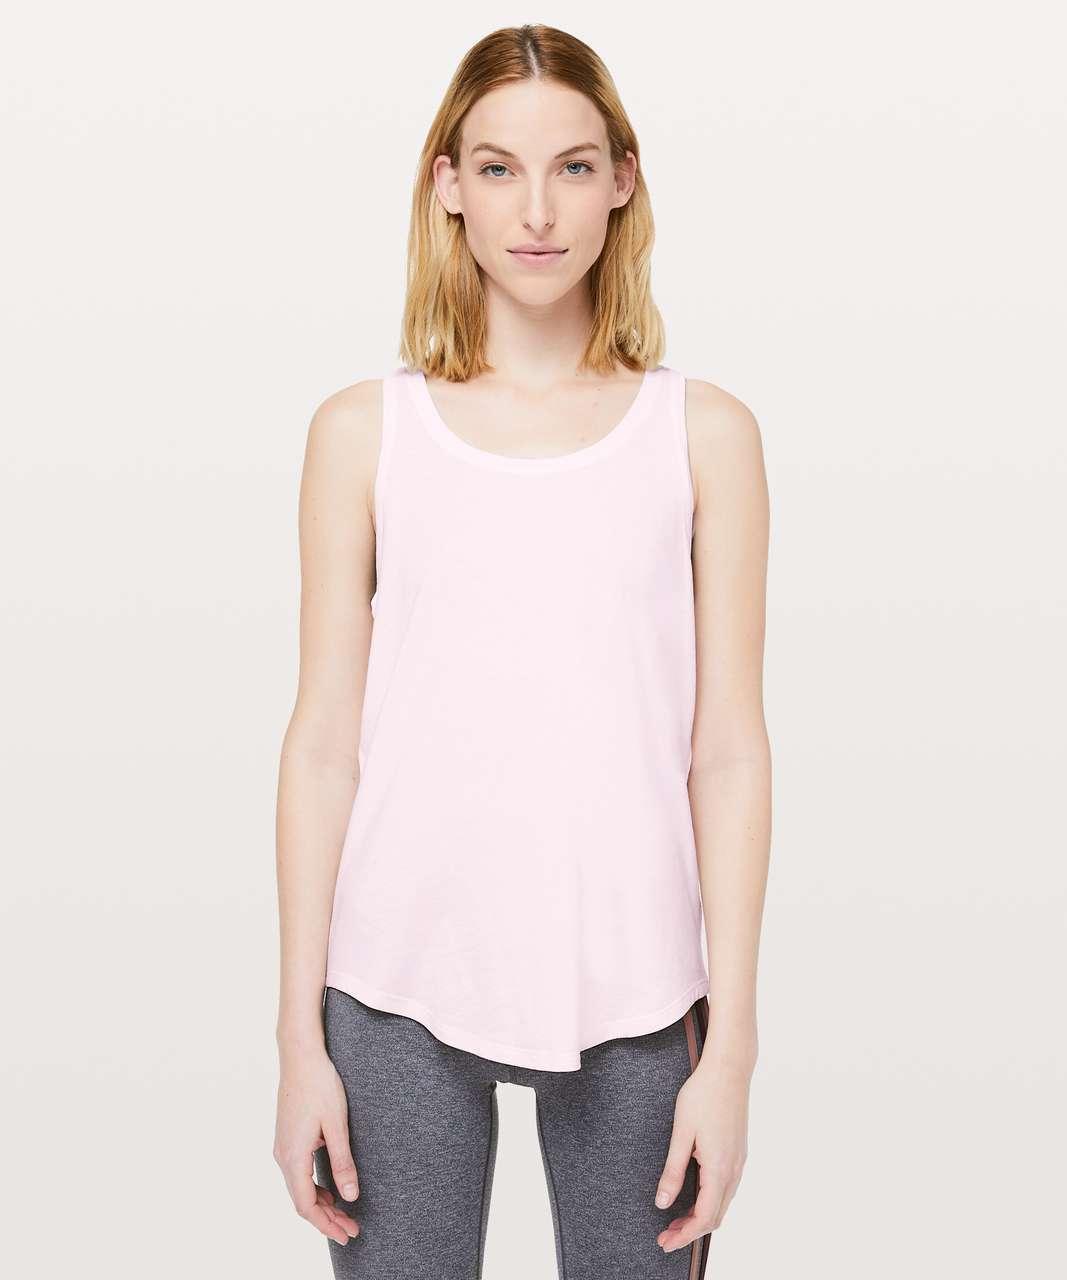 Lululemon Love Tank *Pleated - Pink Glow